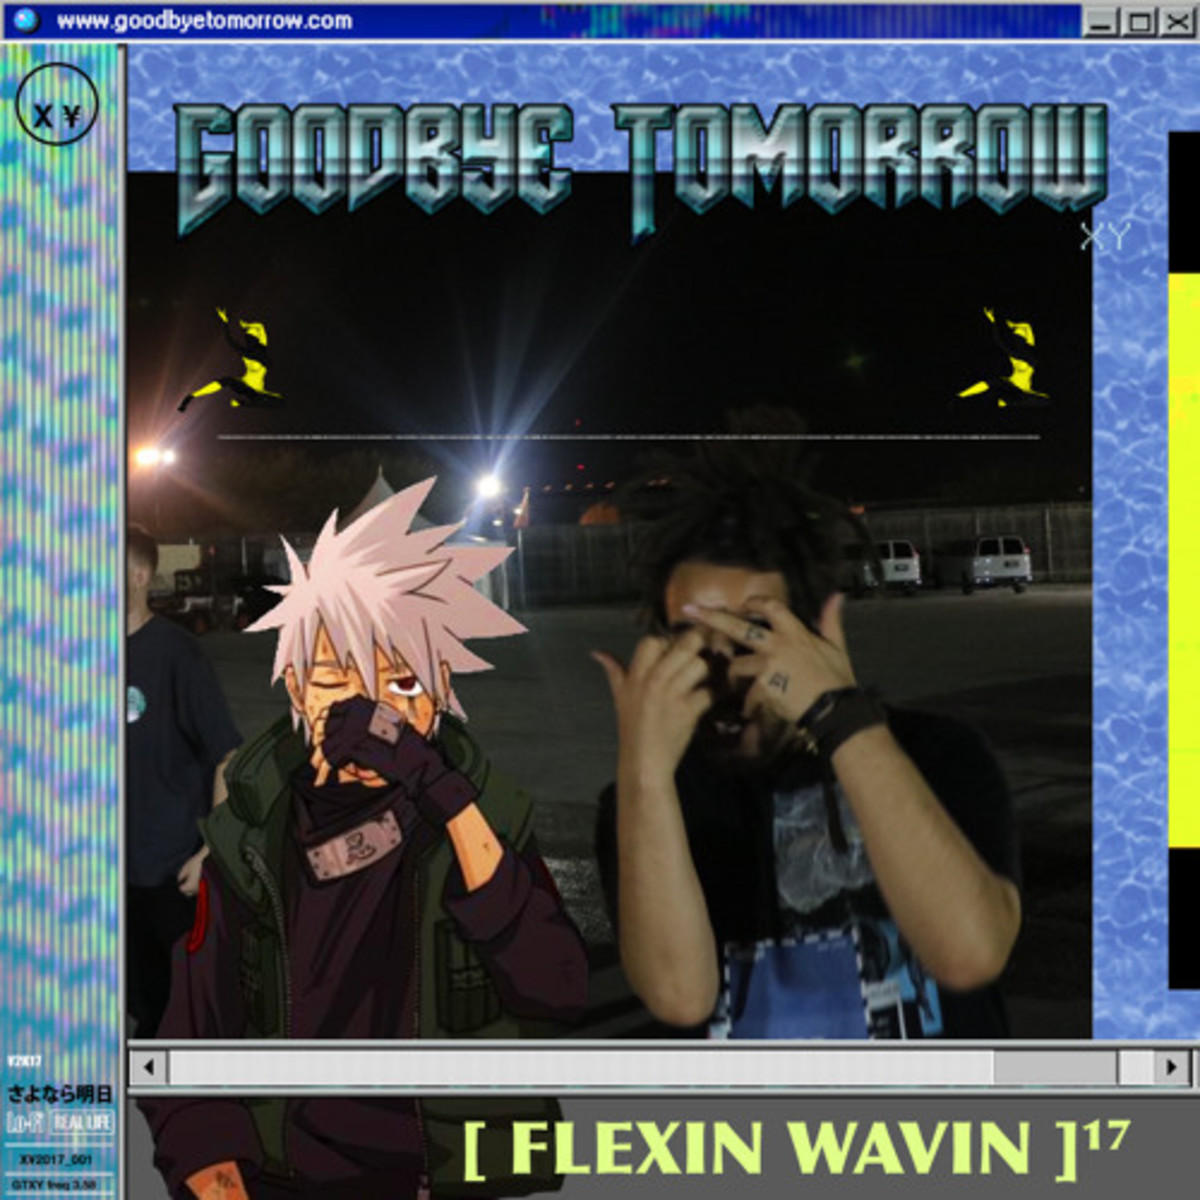 goodbye-tomorrow-flexin-wavin.jpg